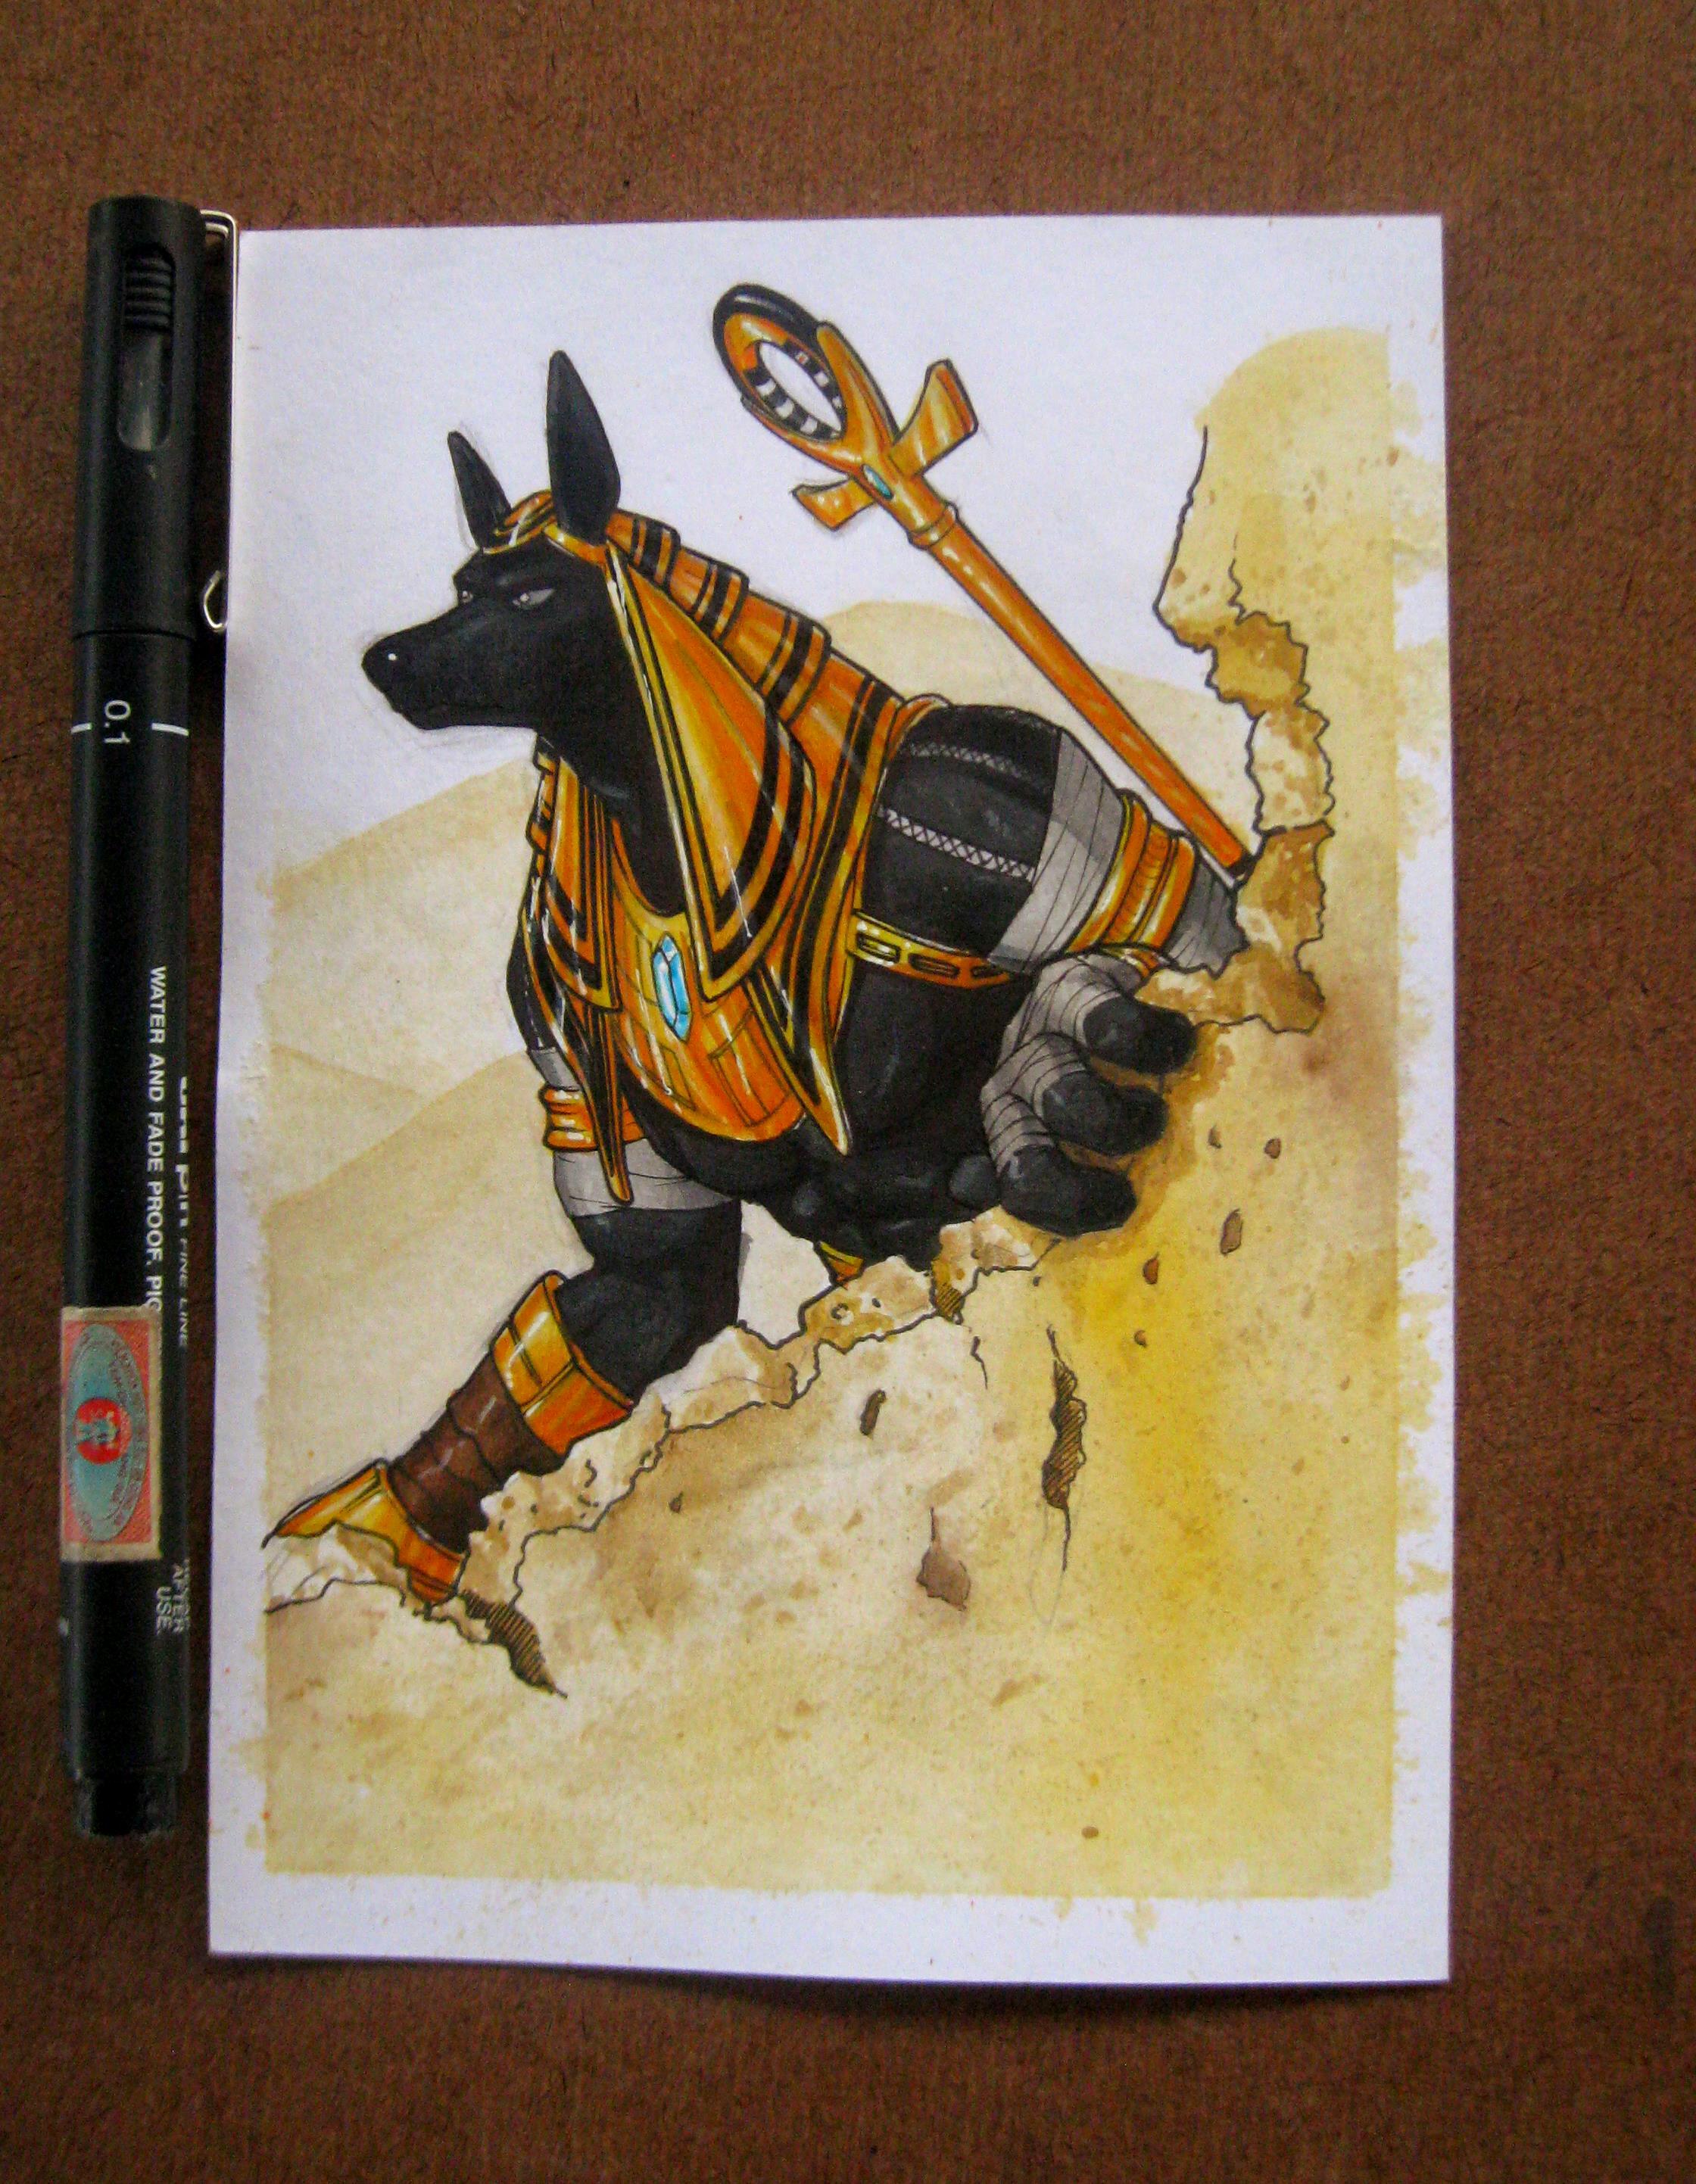 Hapu the Pharaoh hound